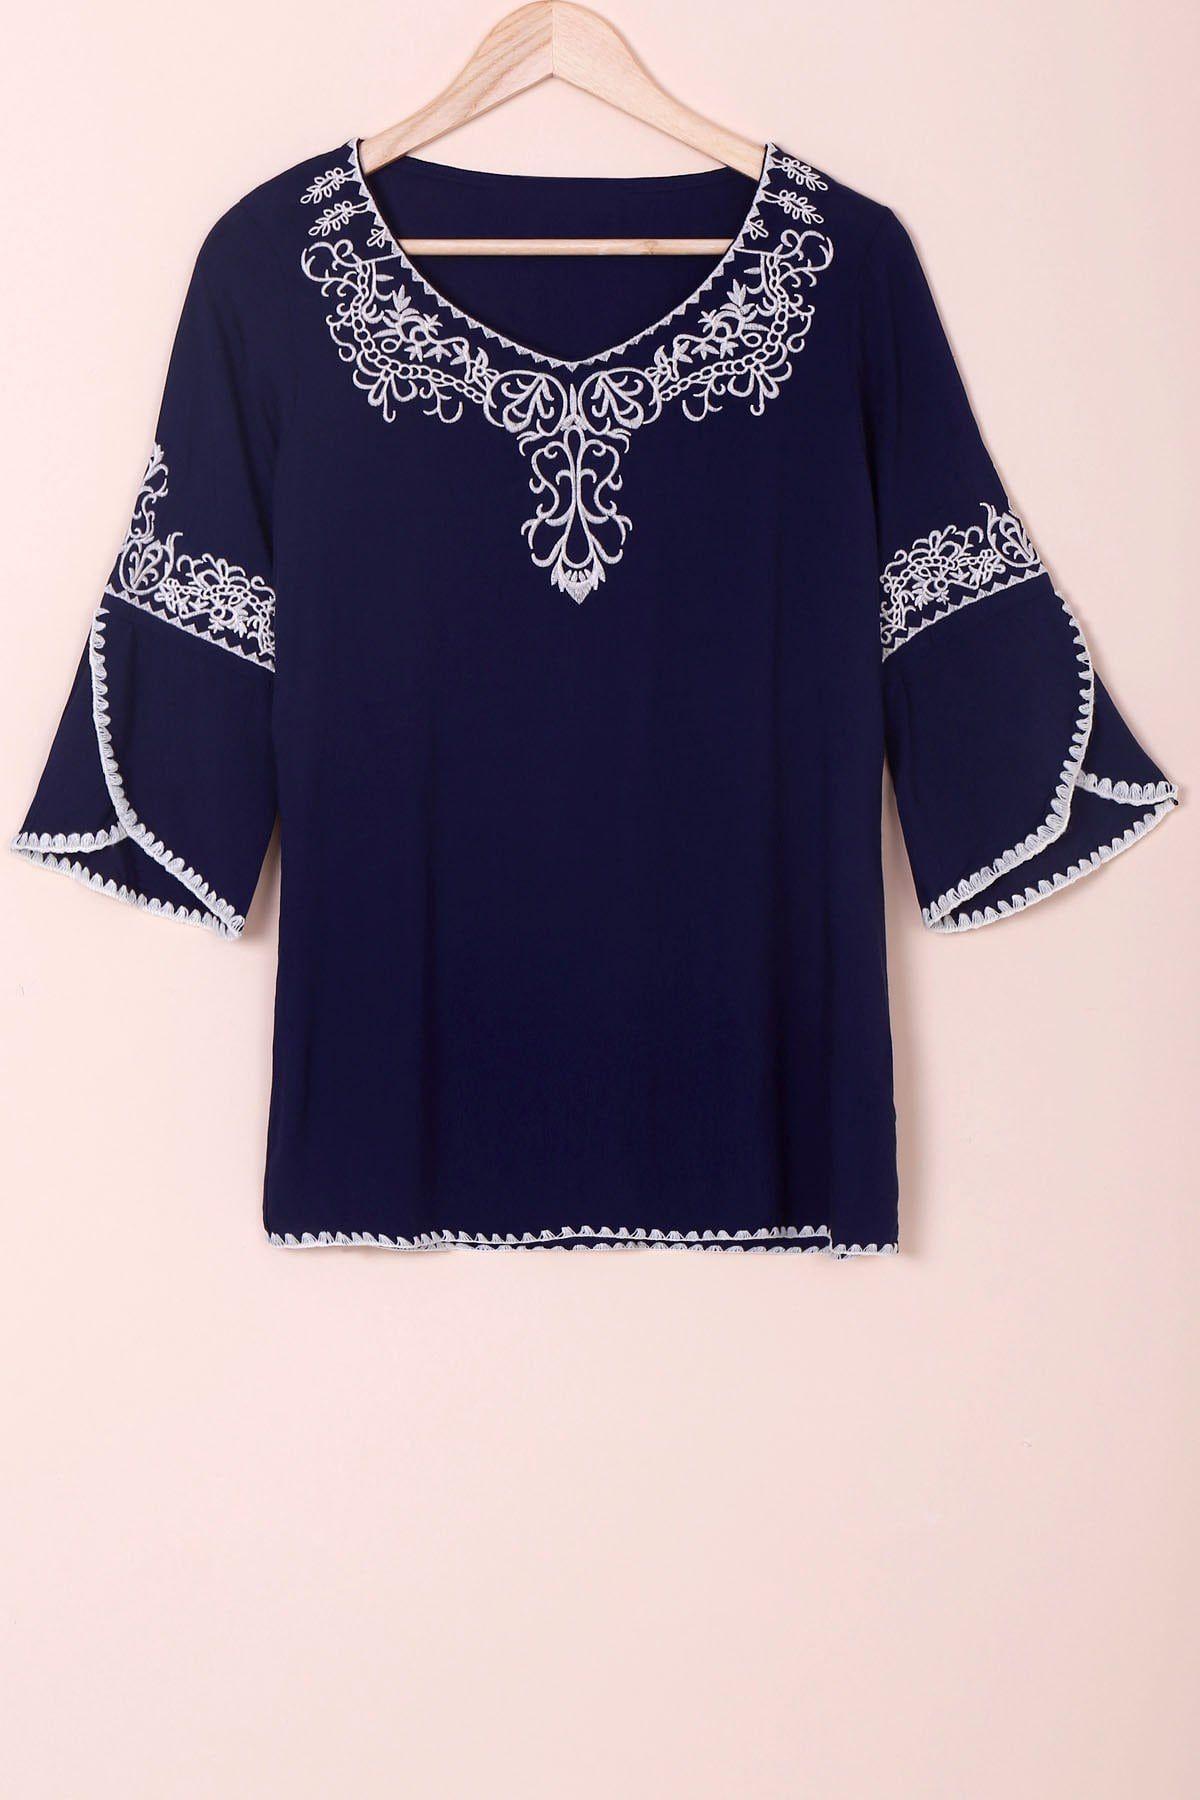 rosegal   Summer dresses, Fashion, Tunic tops